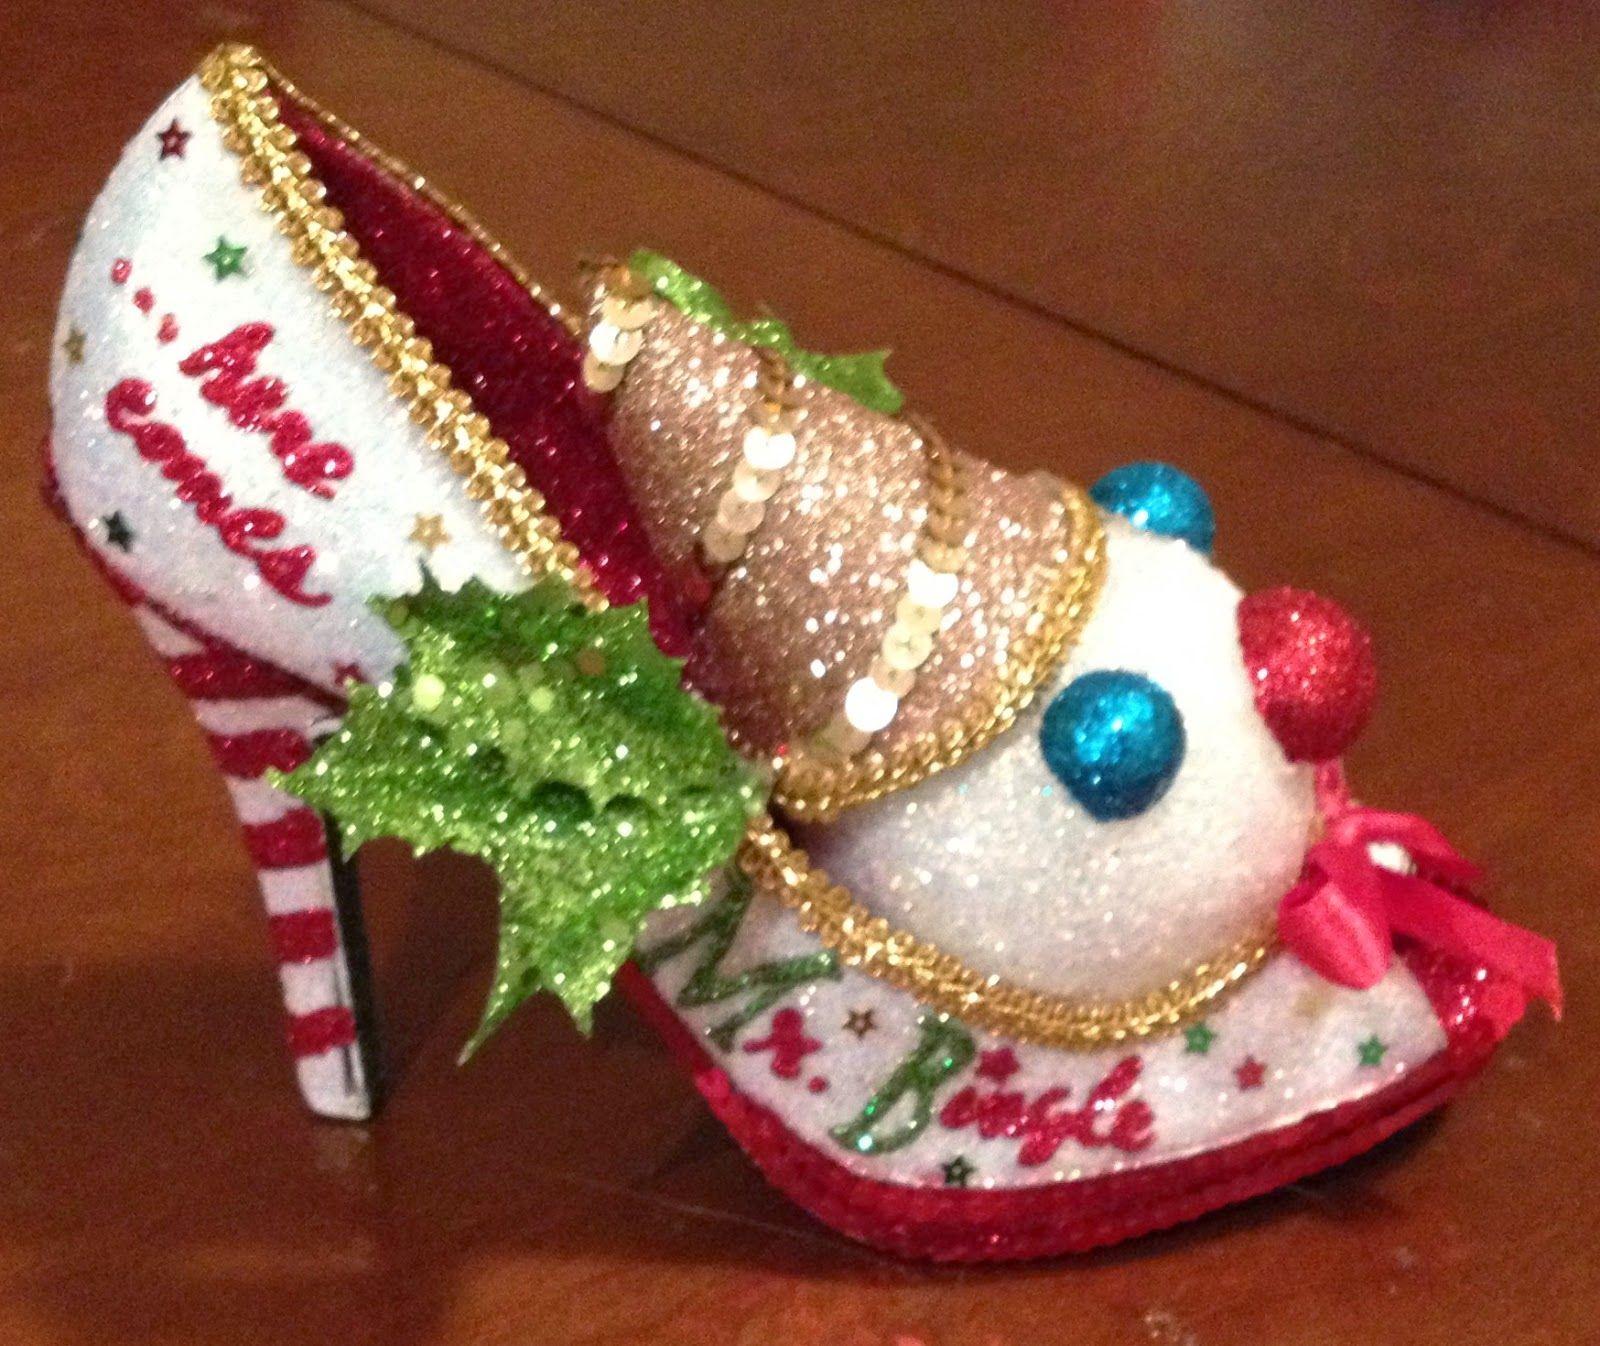 Shoe ornament clips - 2015 Mr Bingle Muses Shoe Muses Shoes Other Glittery Things Shoe Ornament Clips